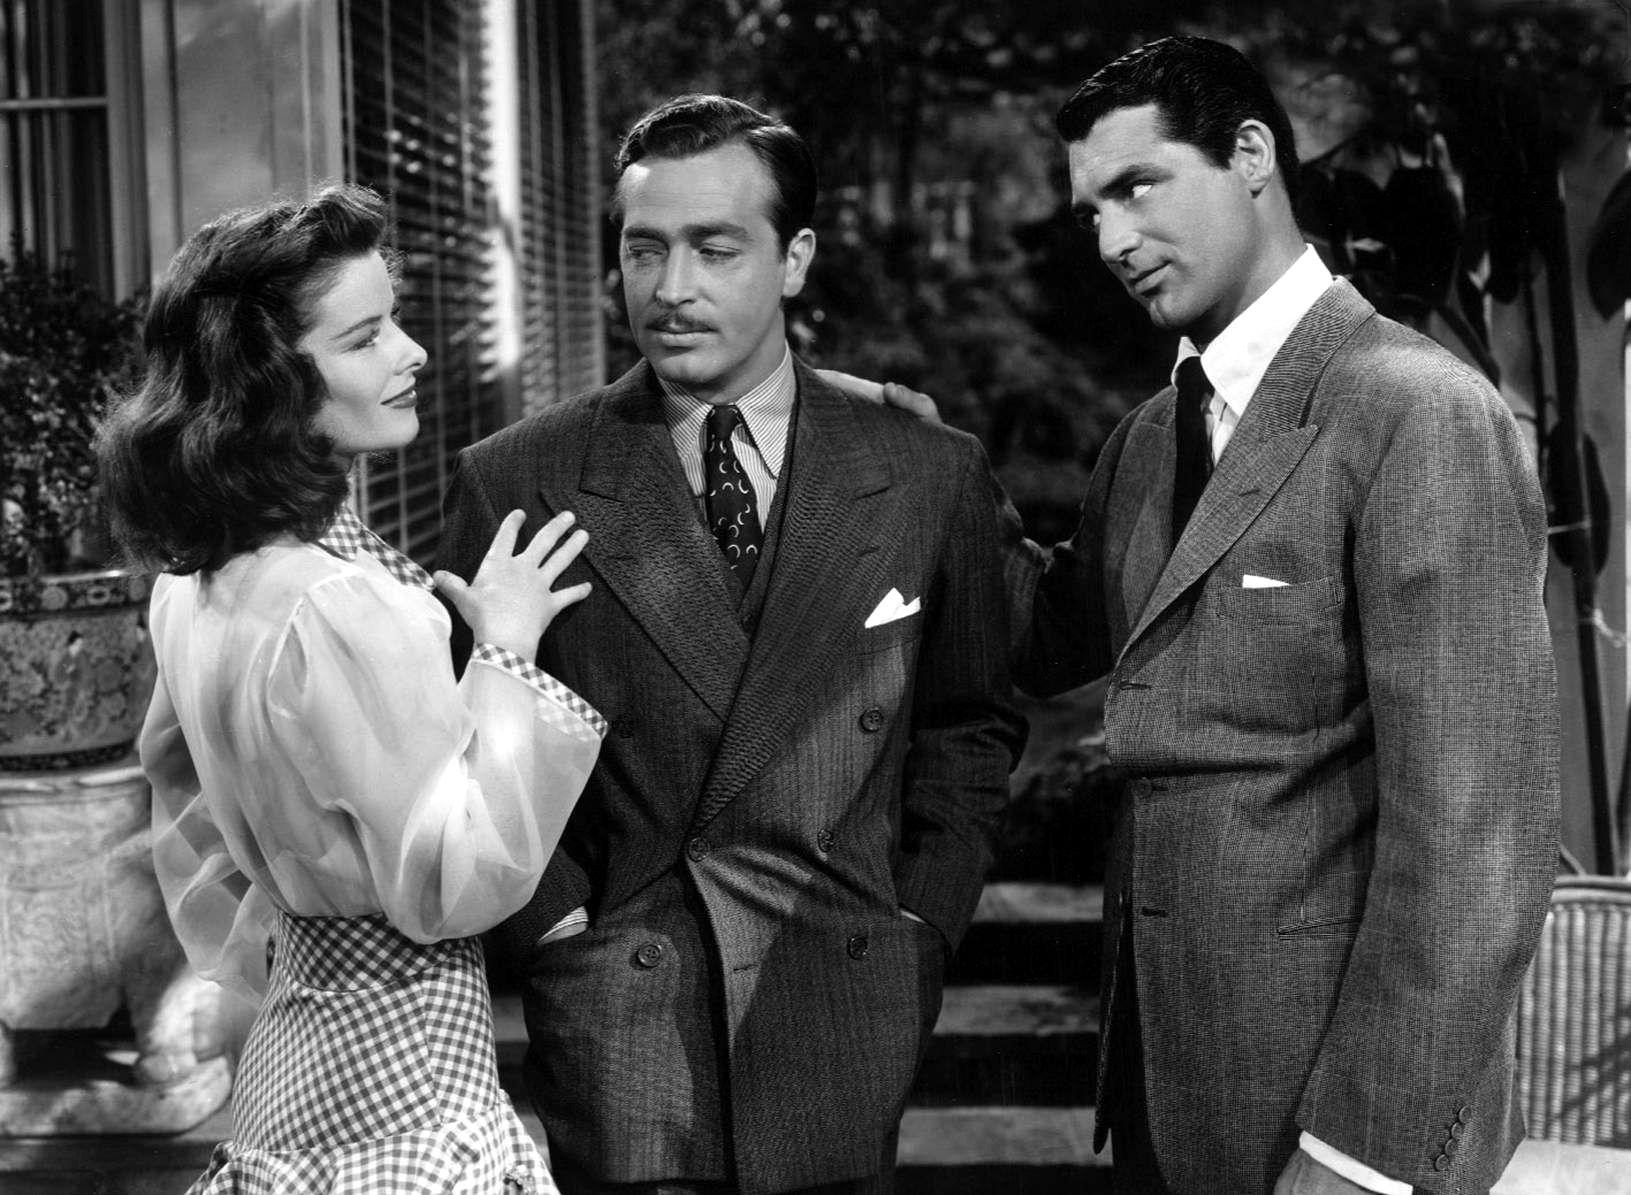 L to R) Katharine Hepburn, John Howard, Cary Grant | The philadelphia story,  Katharine hepburn, Cary grant